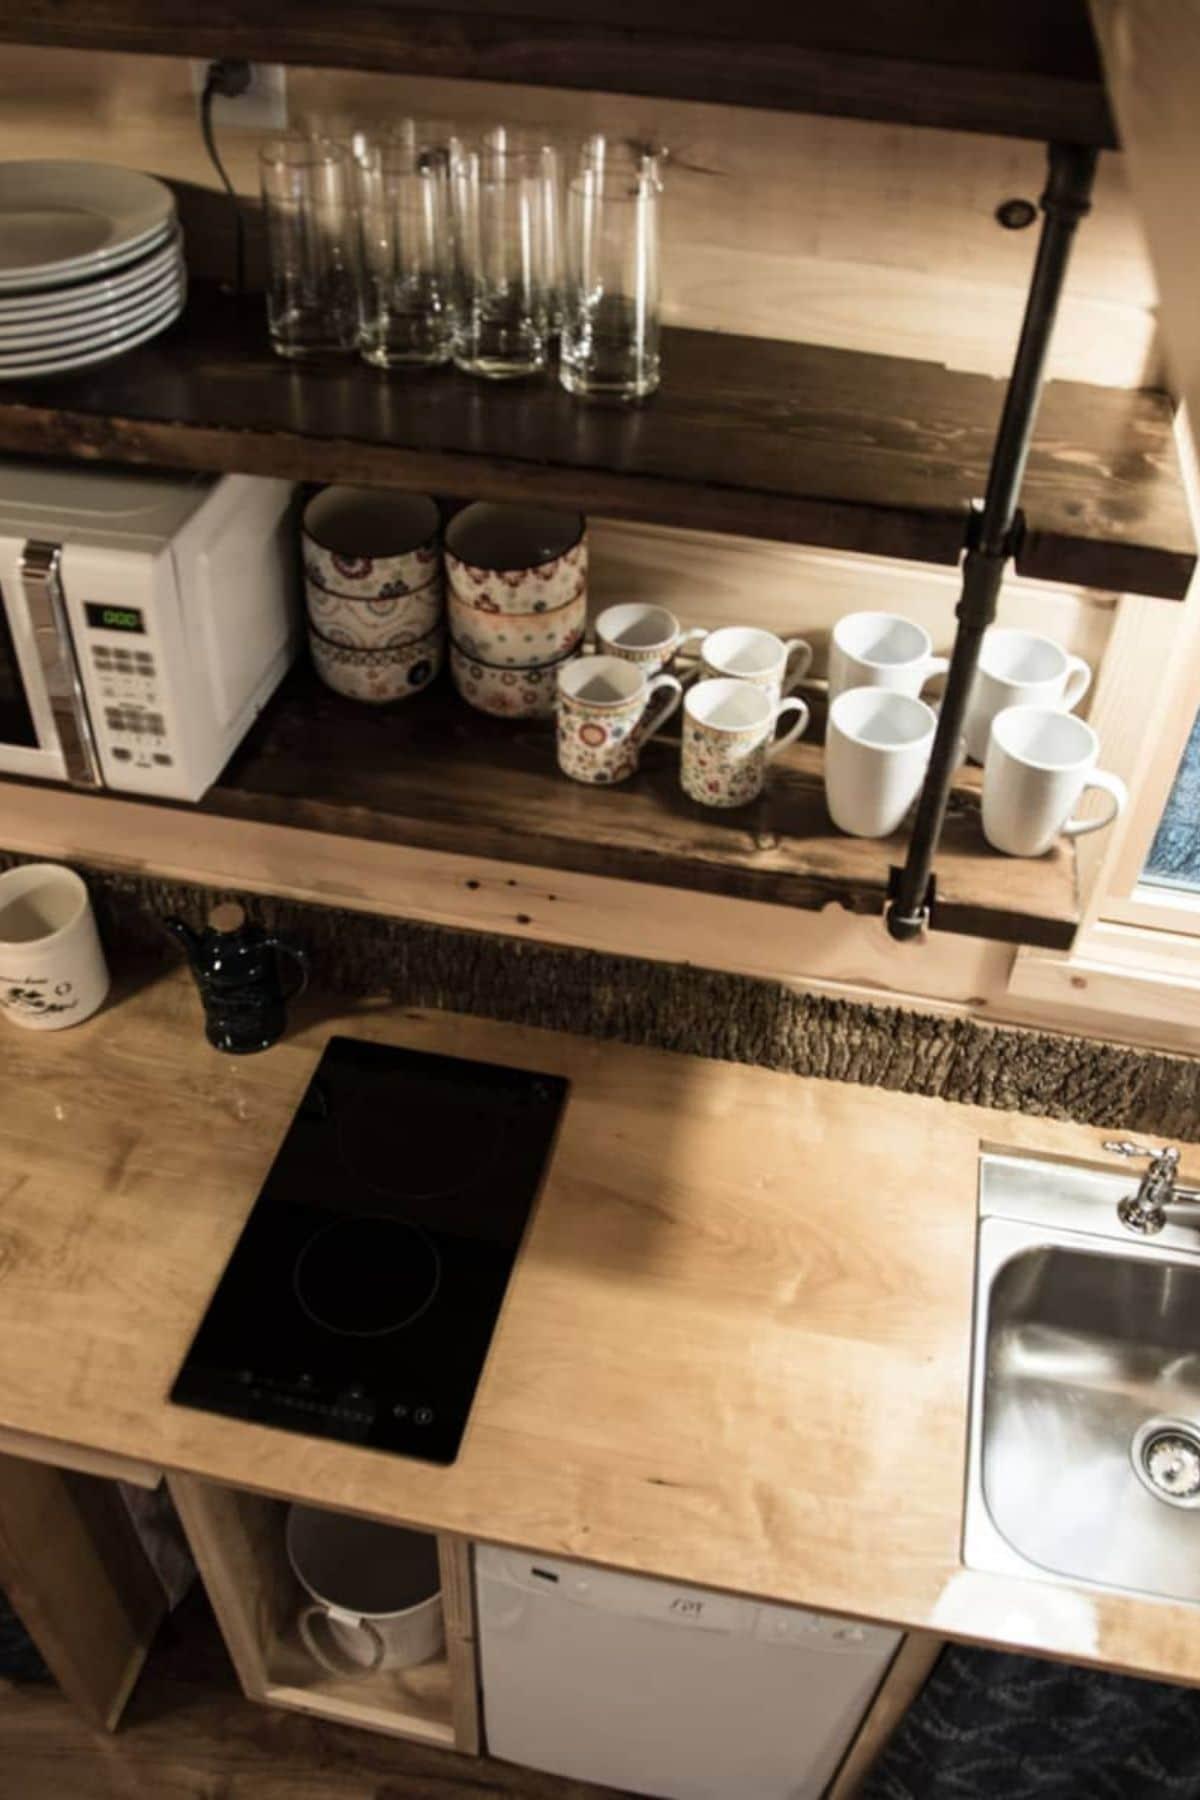 Butcher block counter with 2 burner electric cooktop below shelves